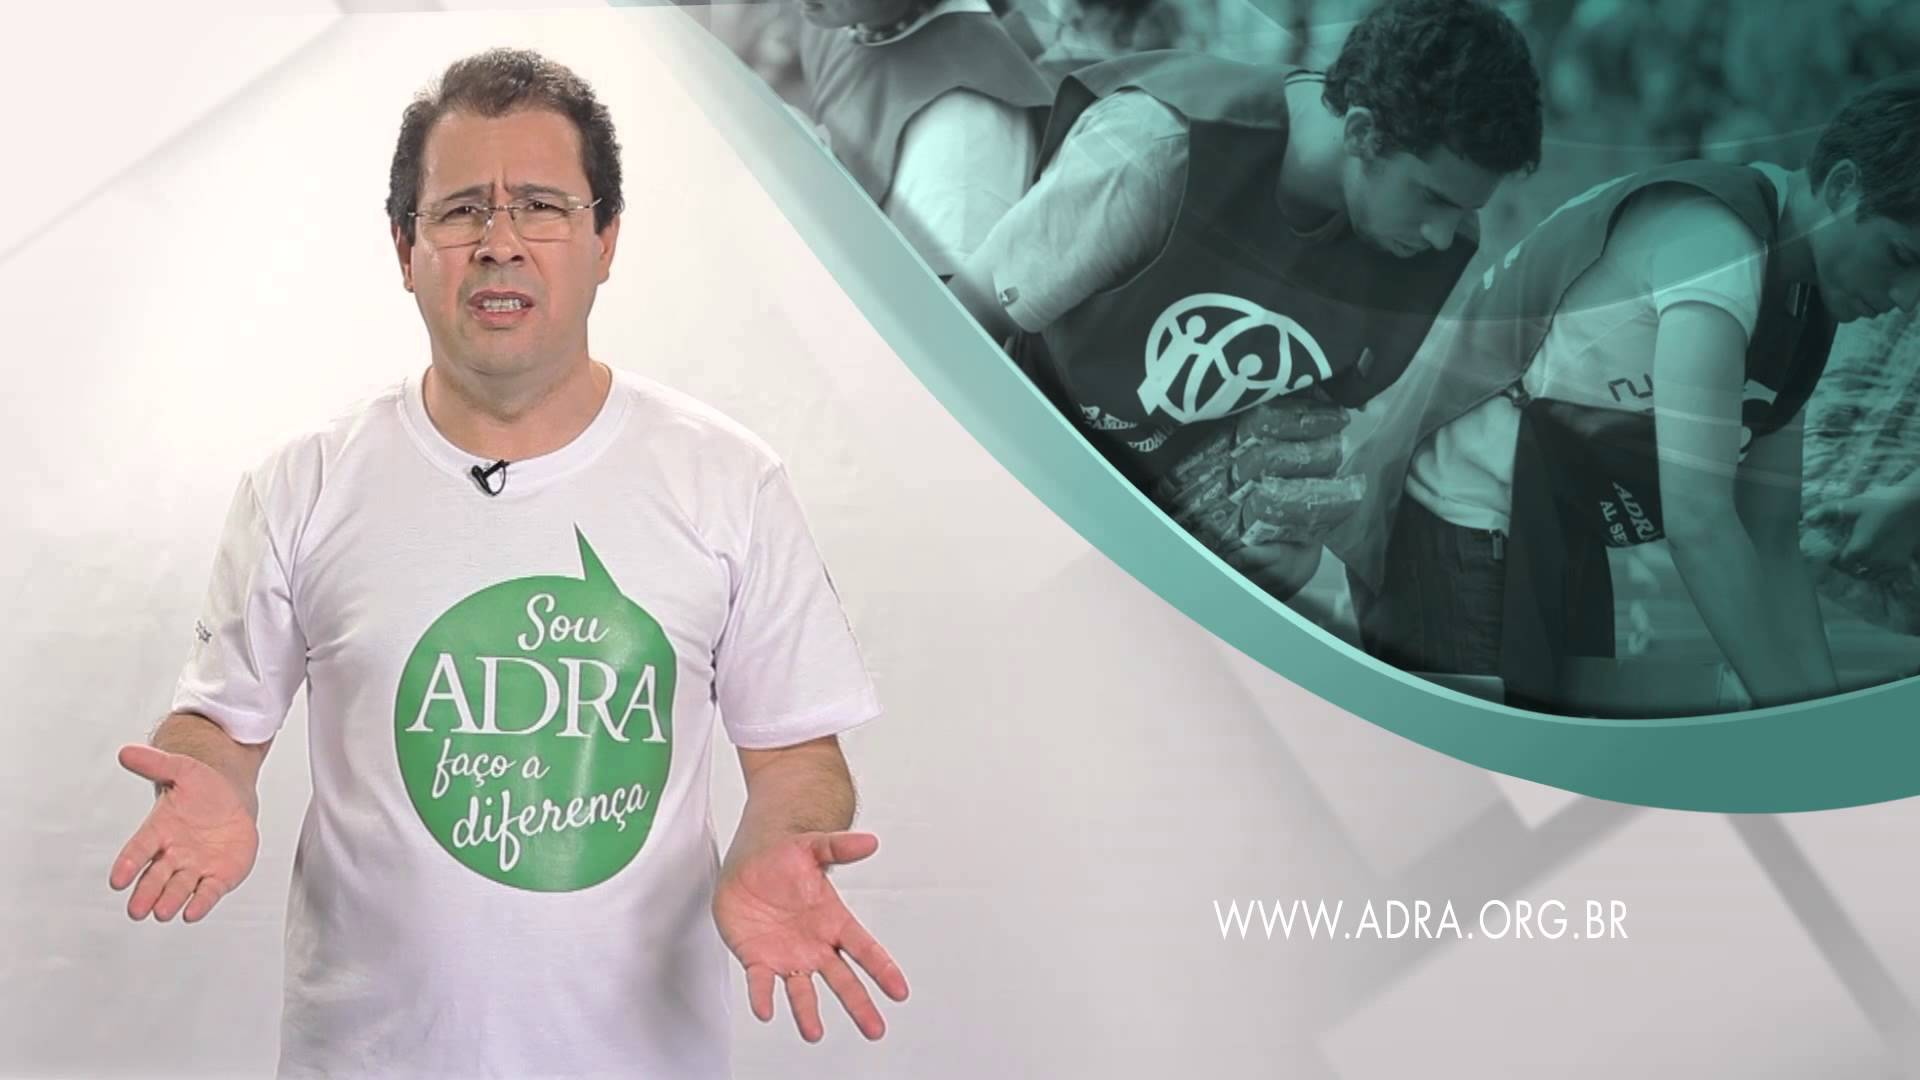 Pr. Areli Barbosa – #souADRA